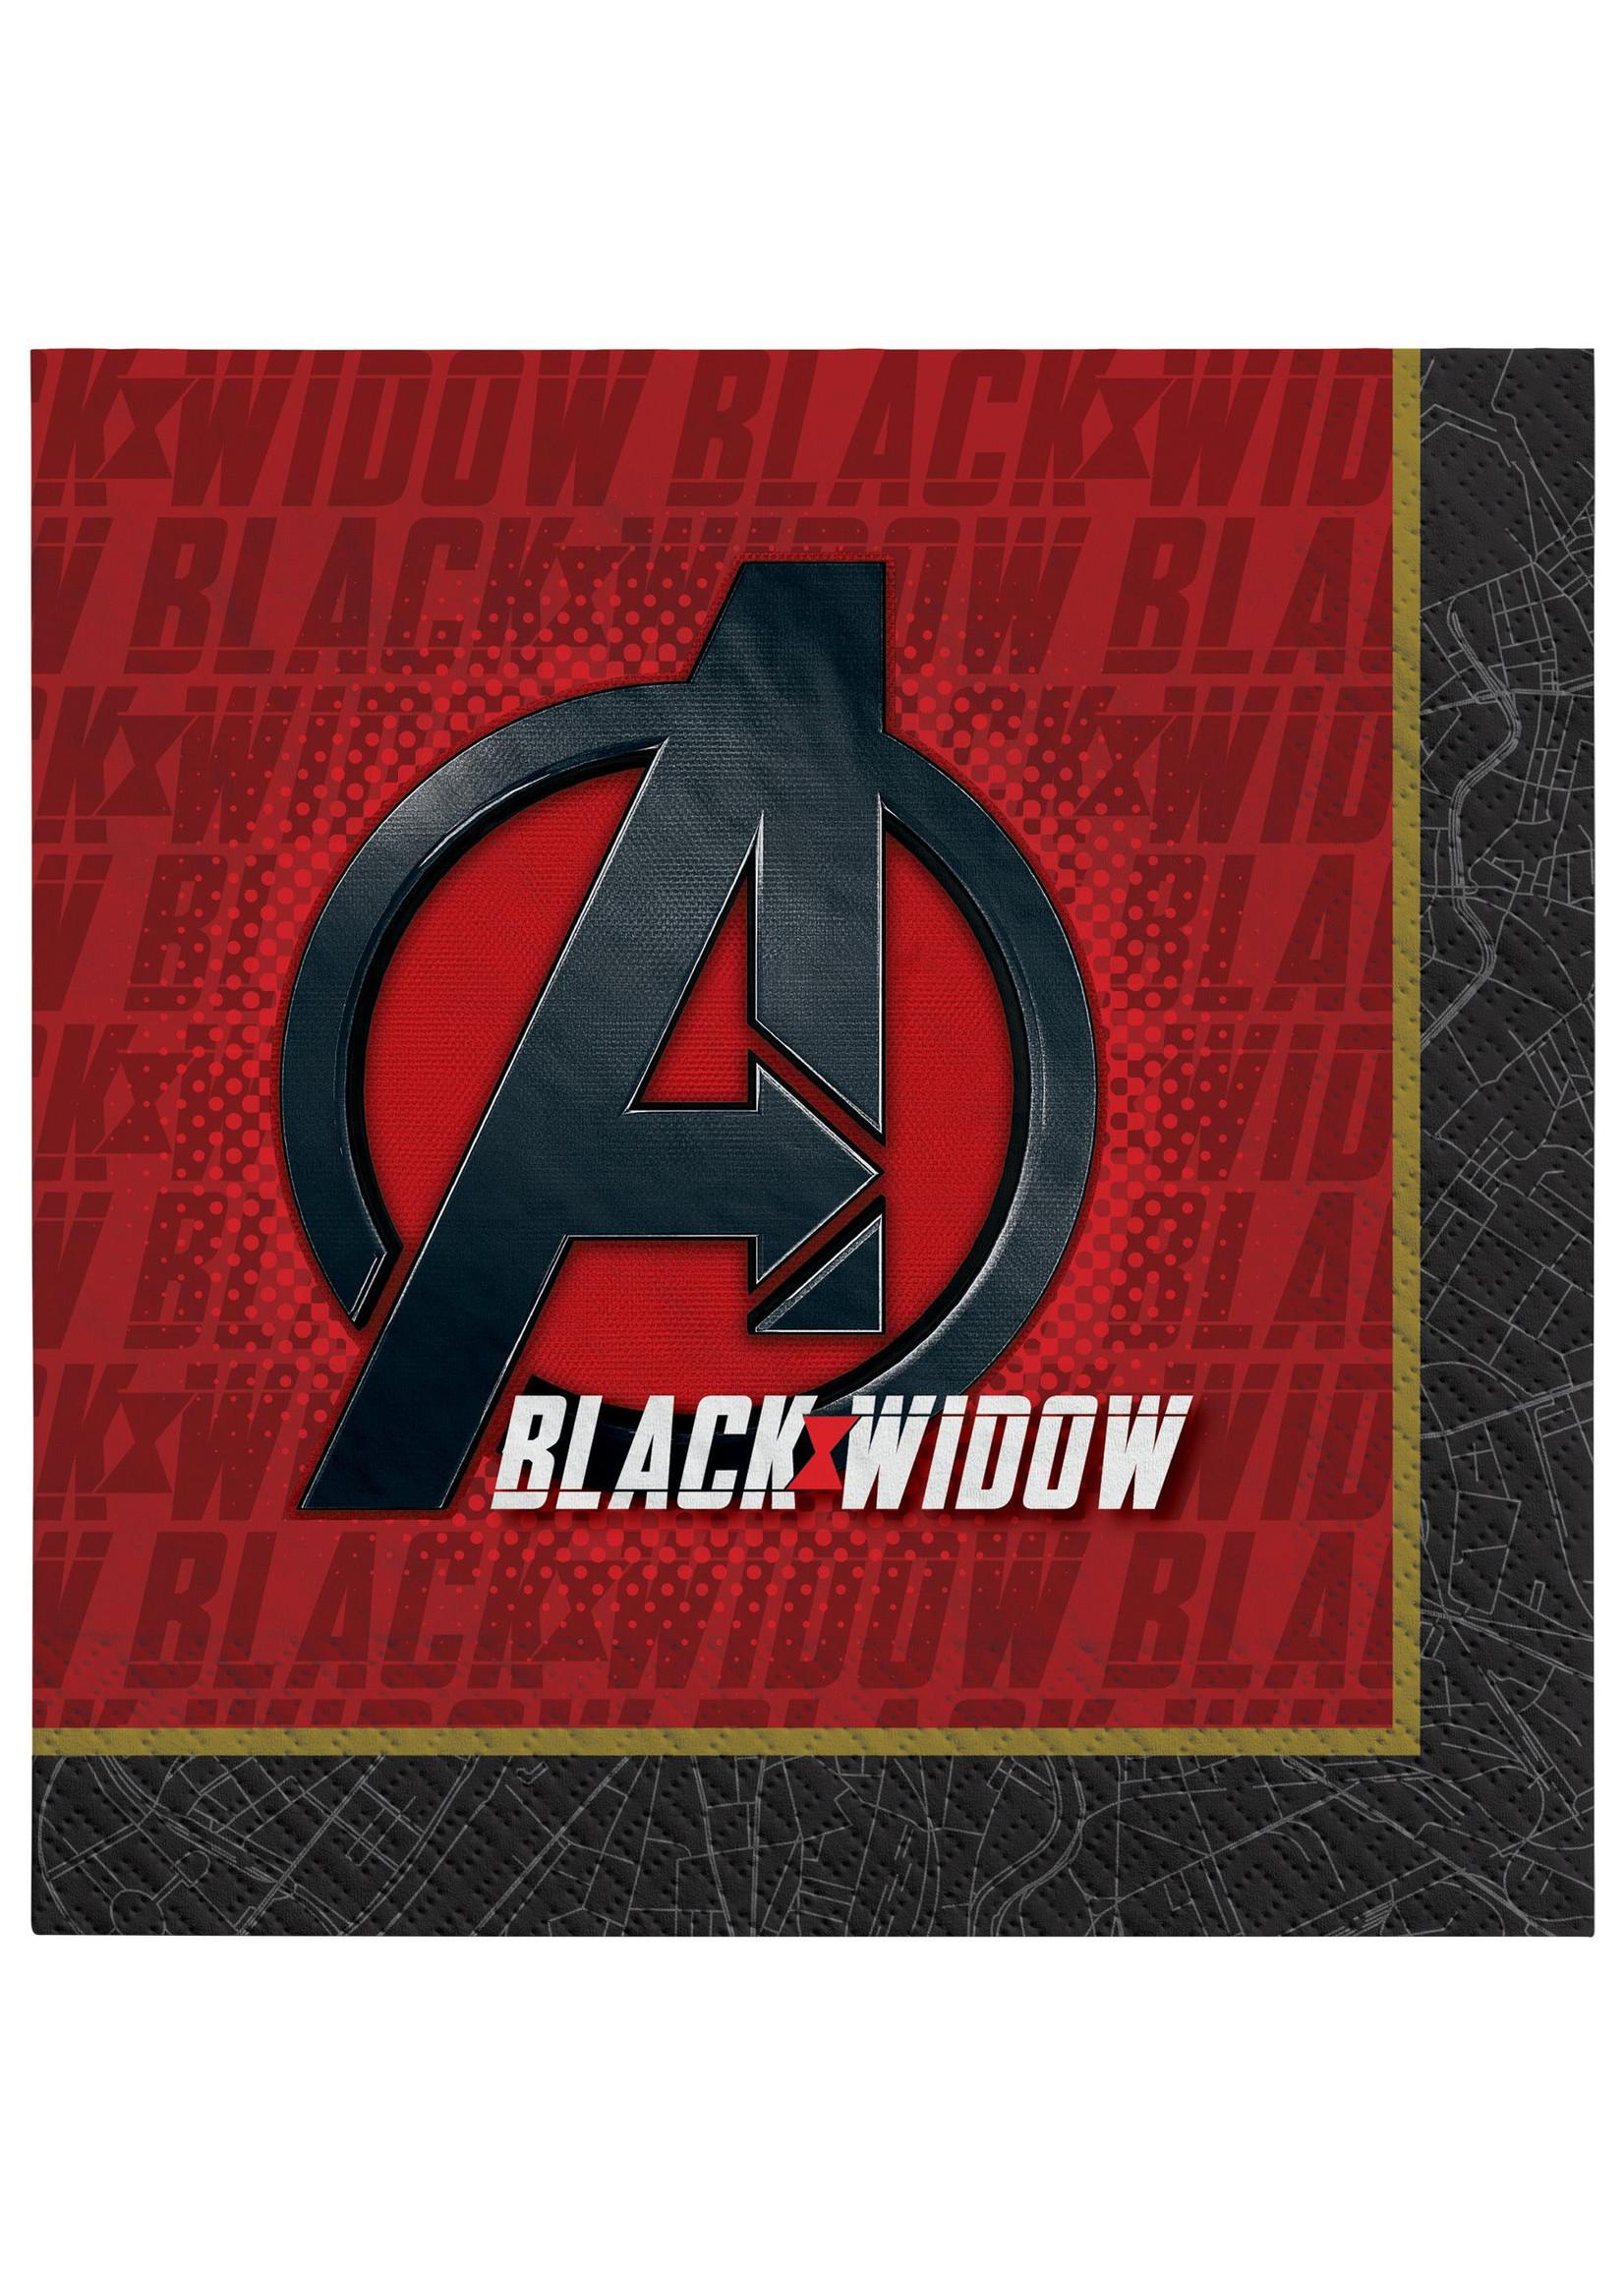 Black Widow Luncheon Napkins - 16ct